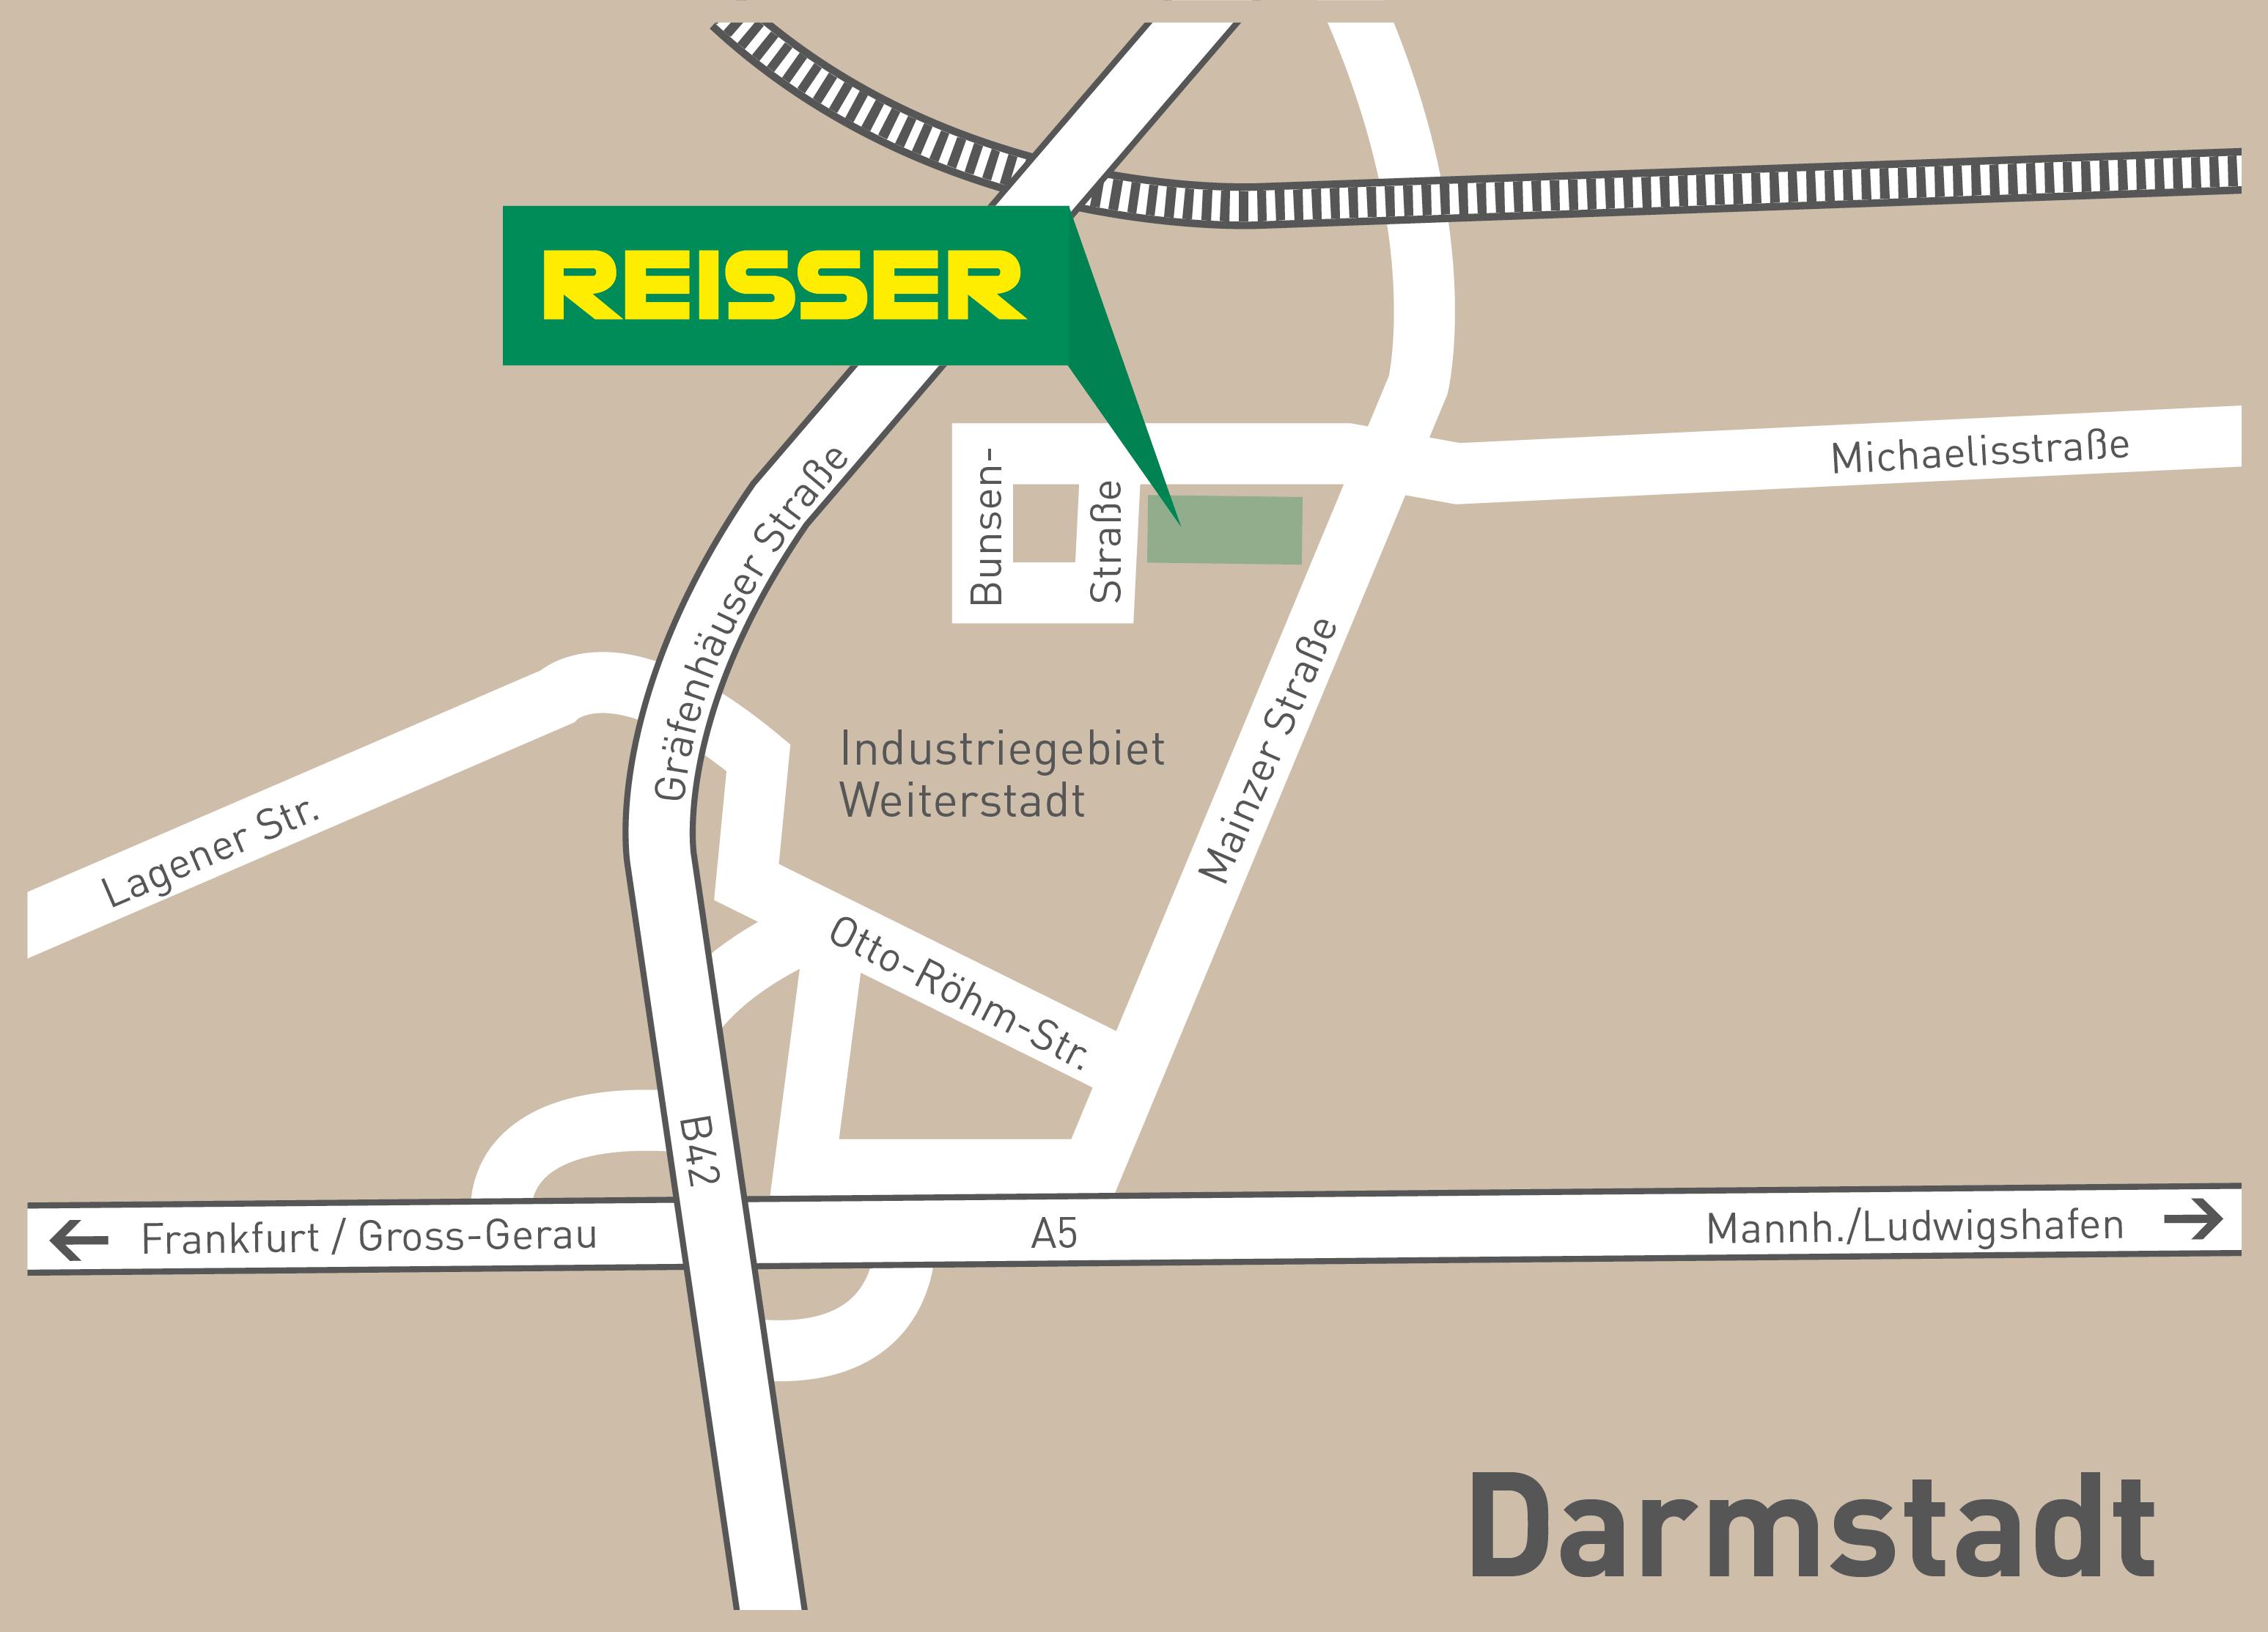 Raumausstatter Darmstadt fachverkauf darmstadt fachhandwerk sanitär heizung installation